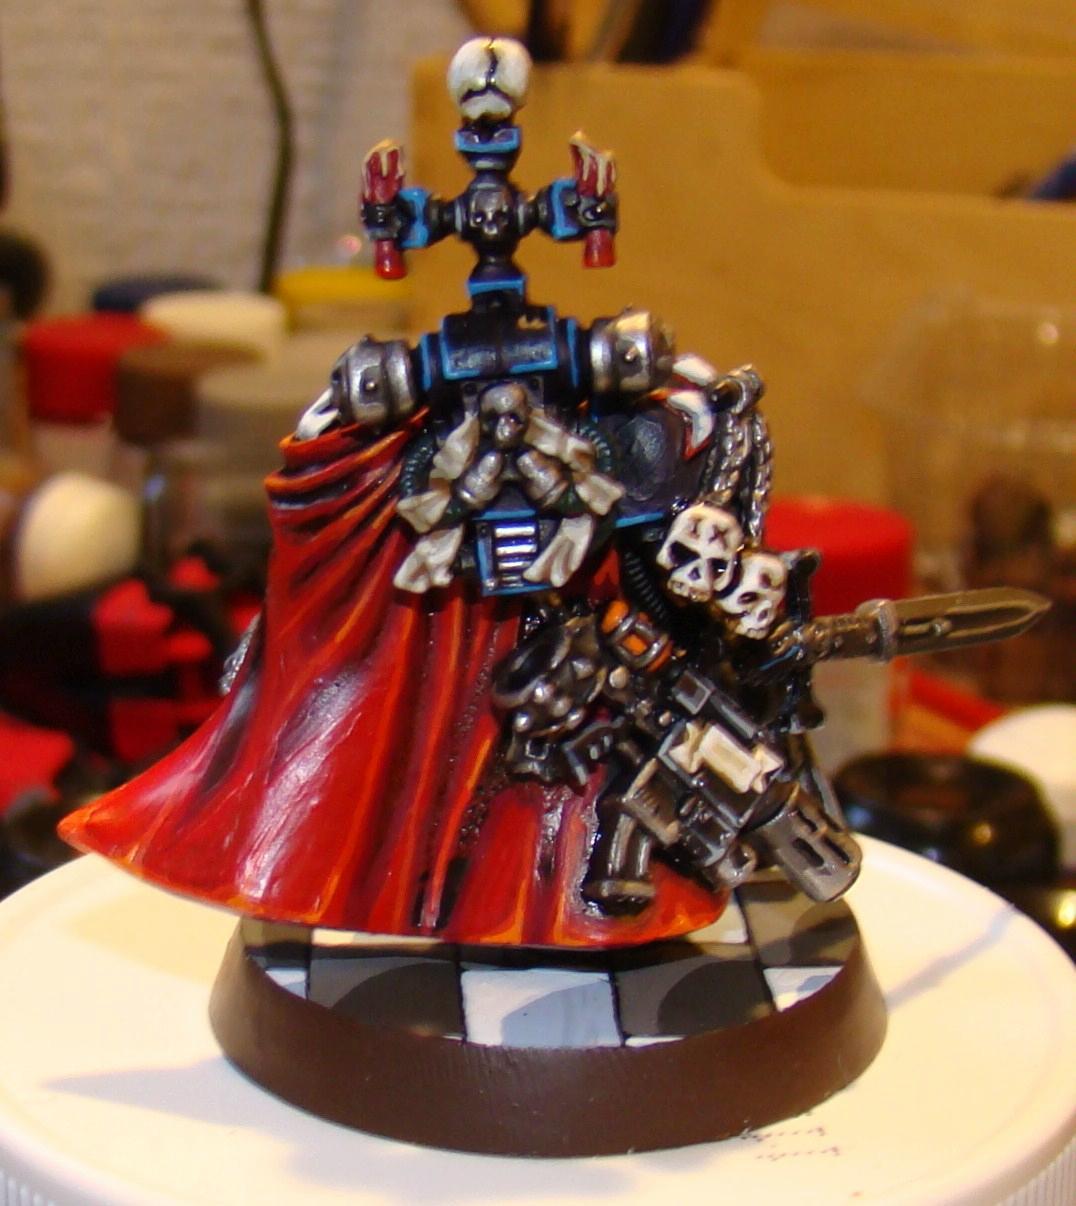 Black Templars, Cape, Helbrecht, Marshal, Space Marines, Warhammer 40,000